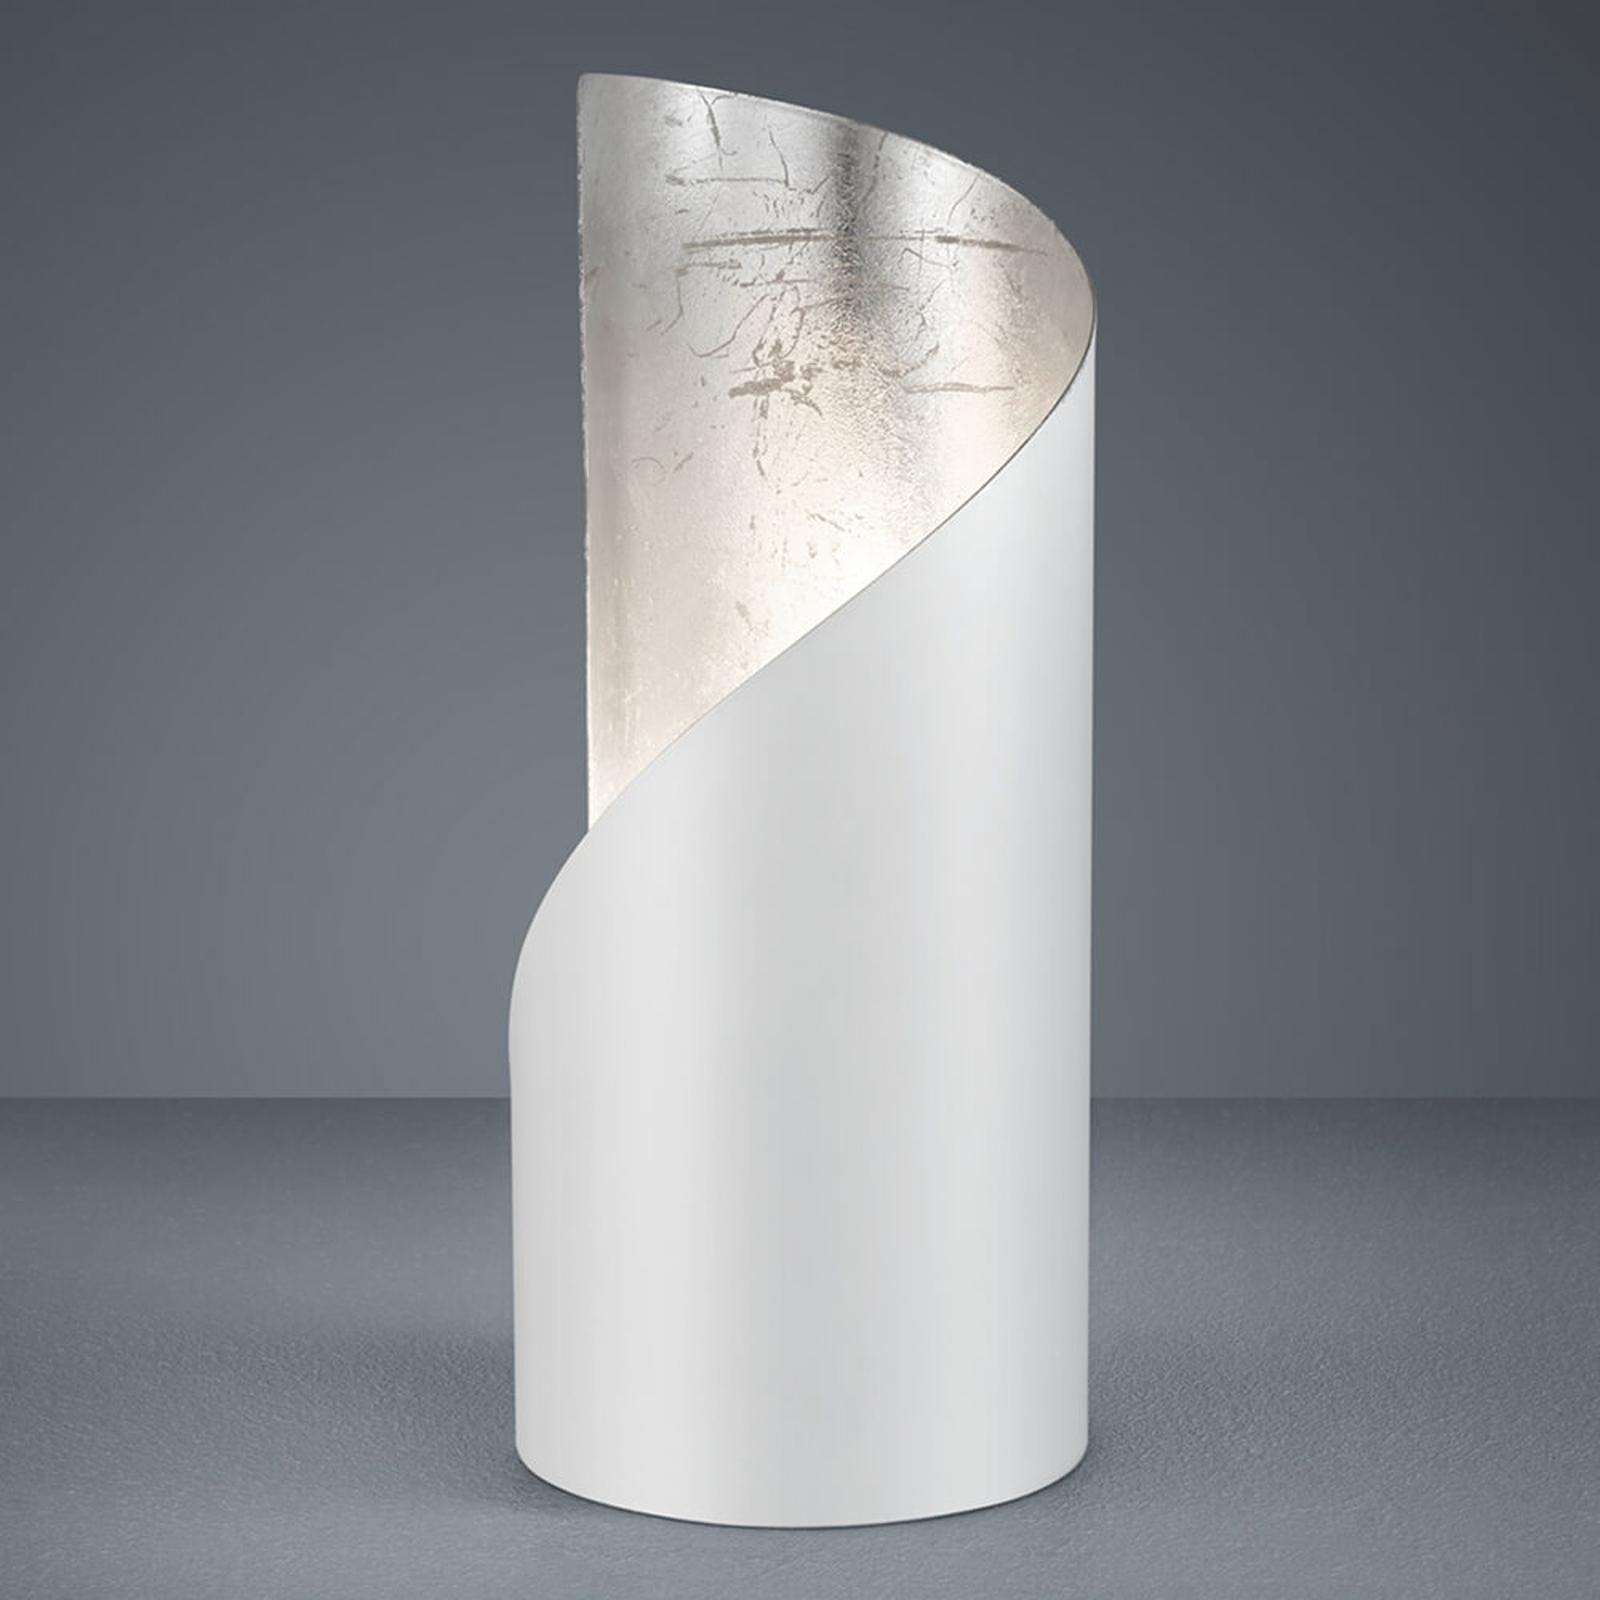 Tafellamp Frank - wit en zilver